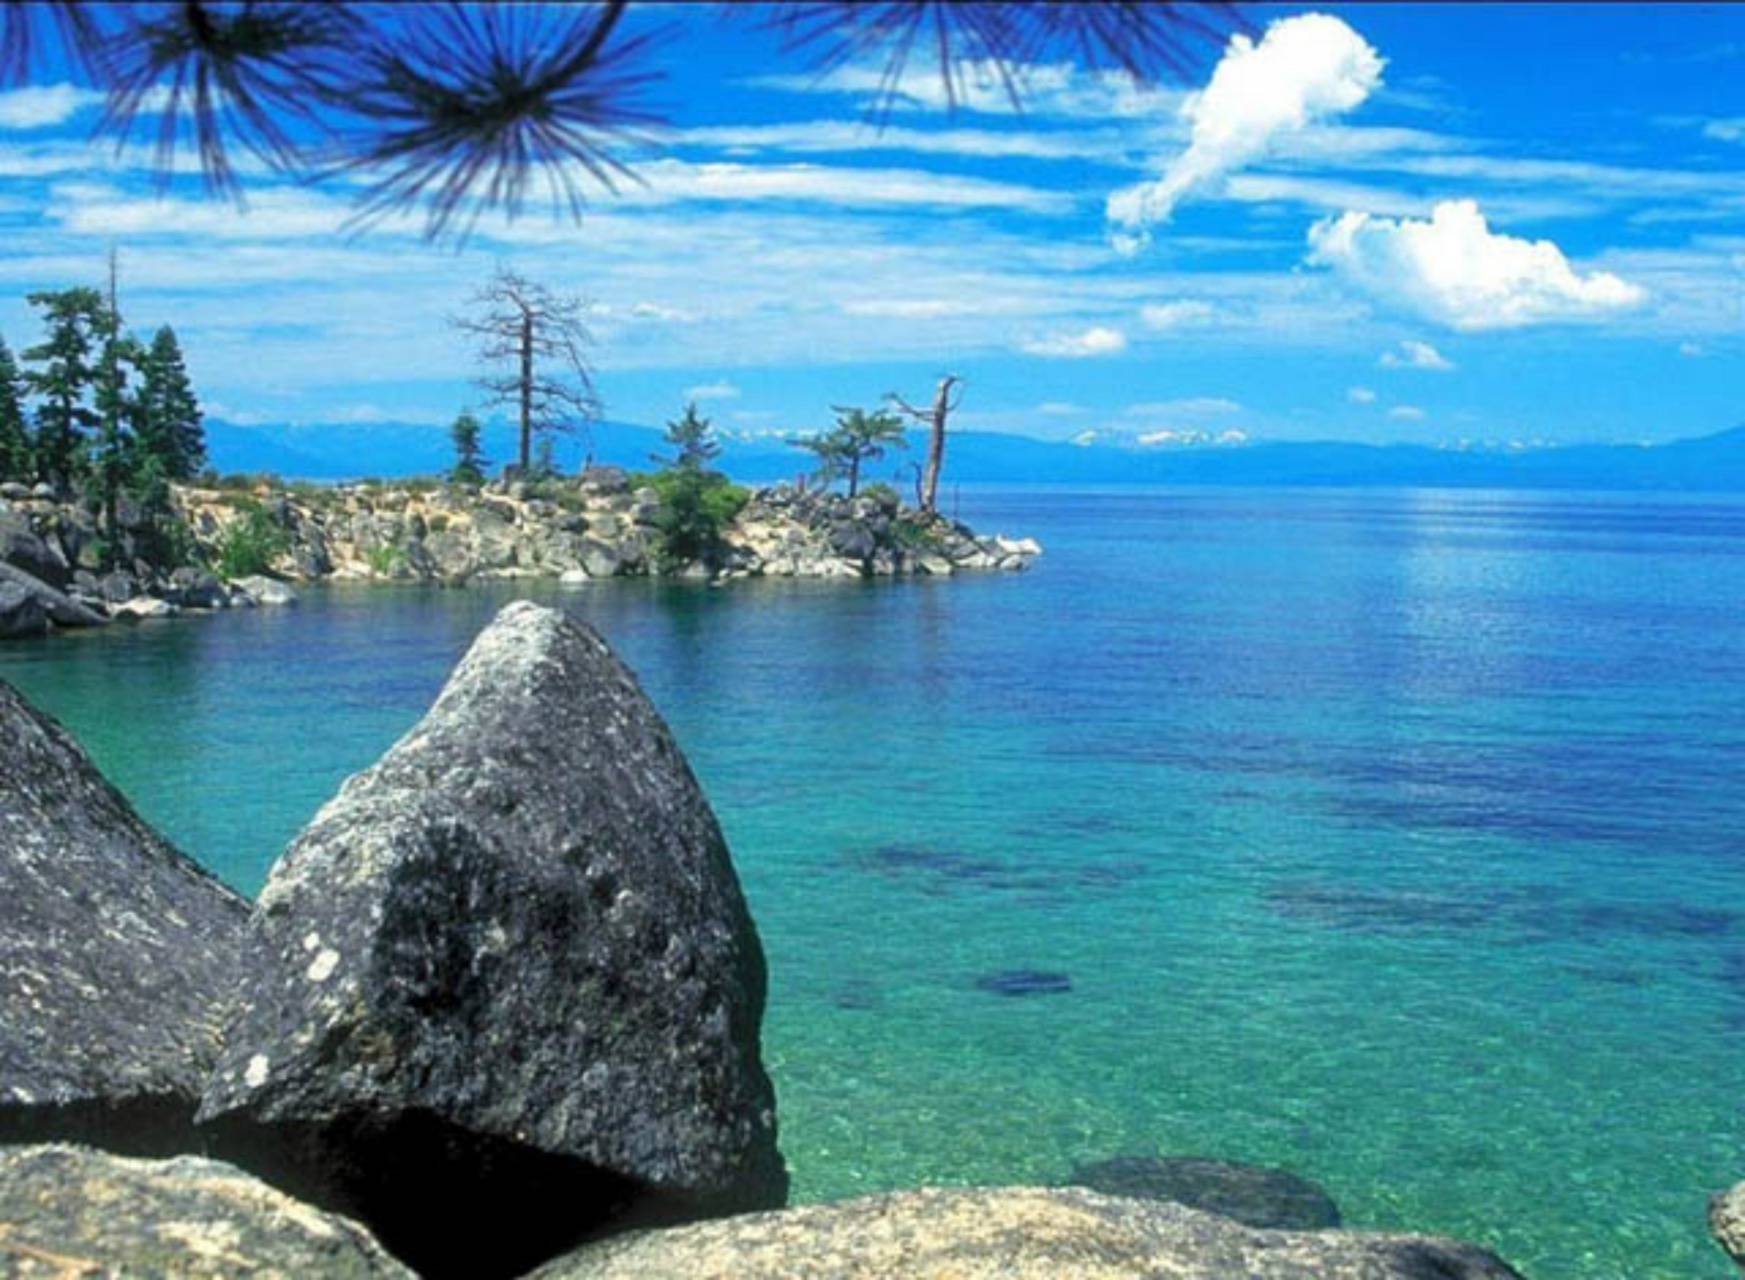 hd blue ocean